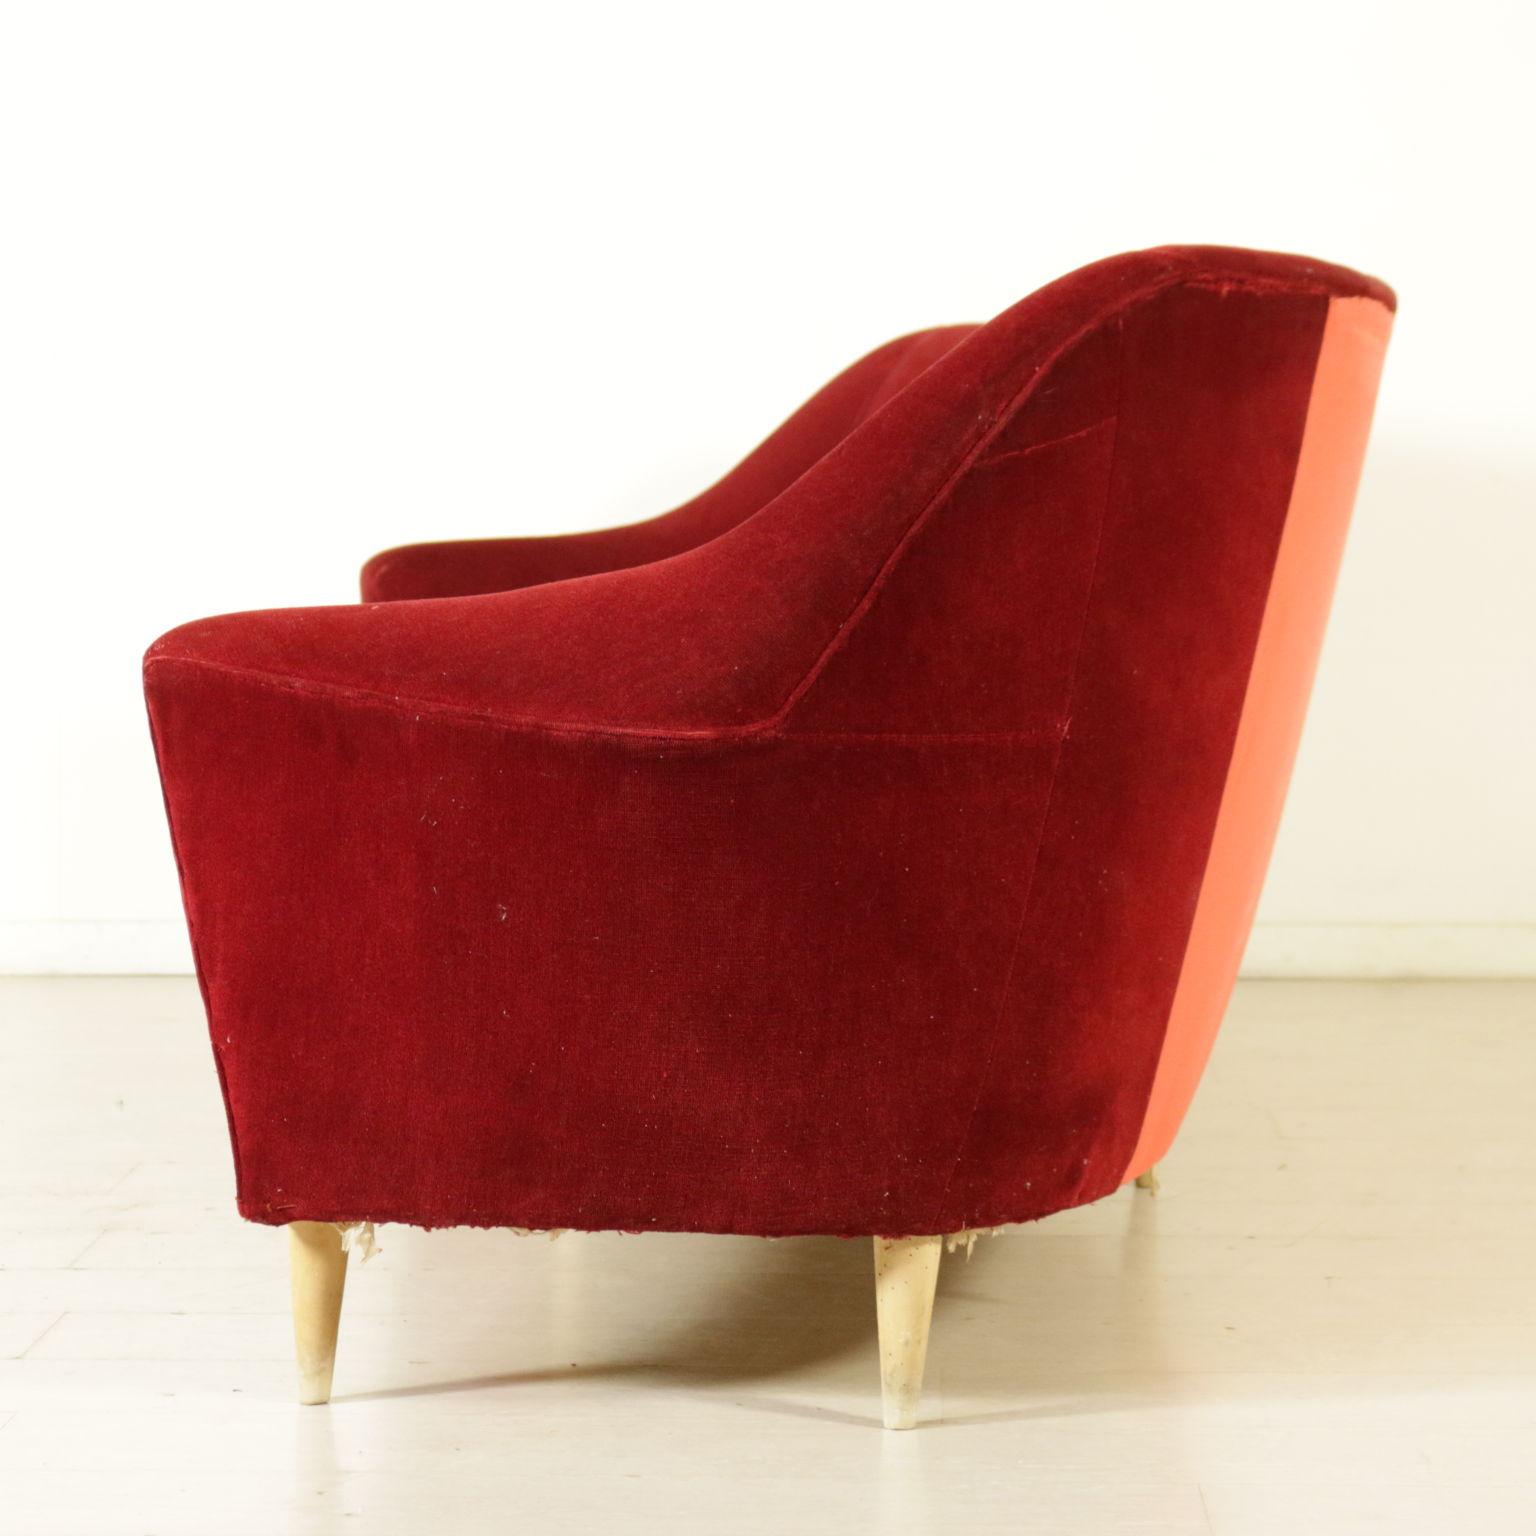 canap ann es 50 canap s design moderne. Black Bedroom Furniture Sets. Home Design Ideas